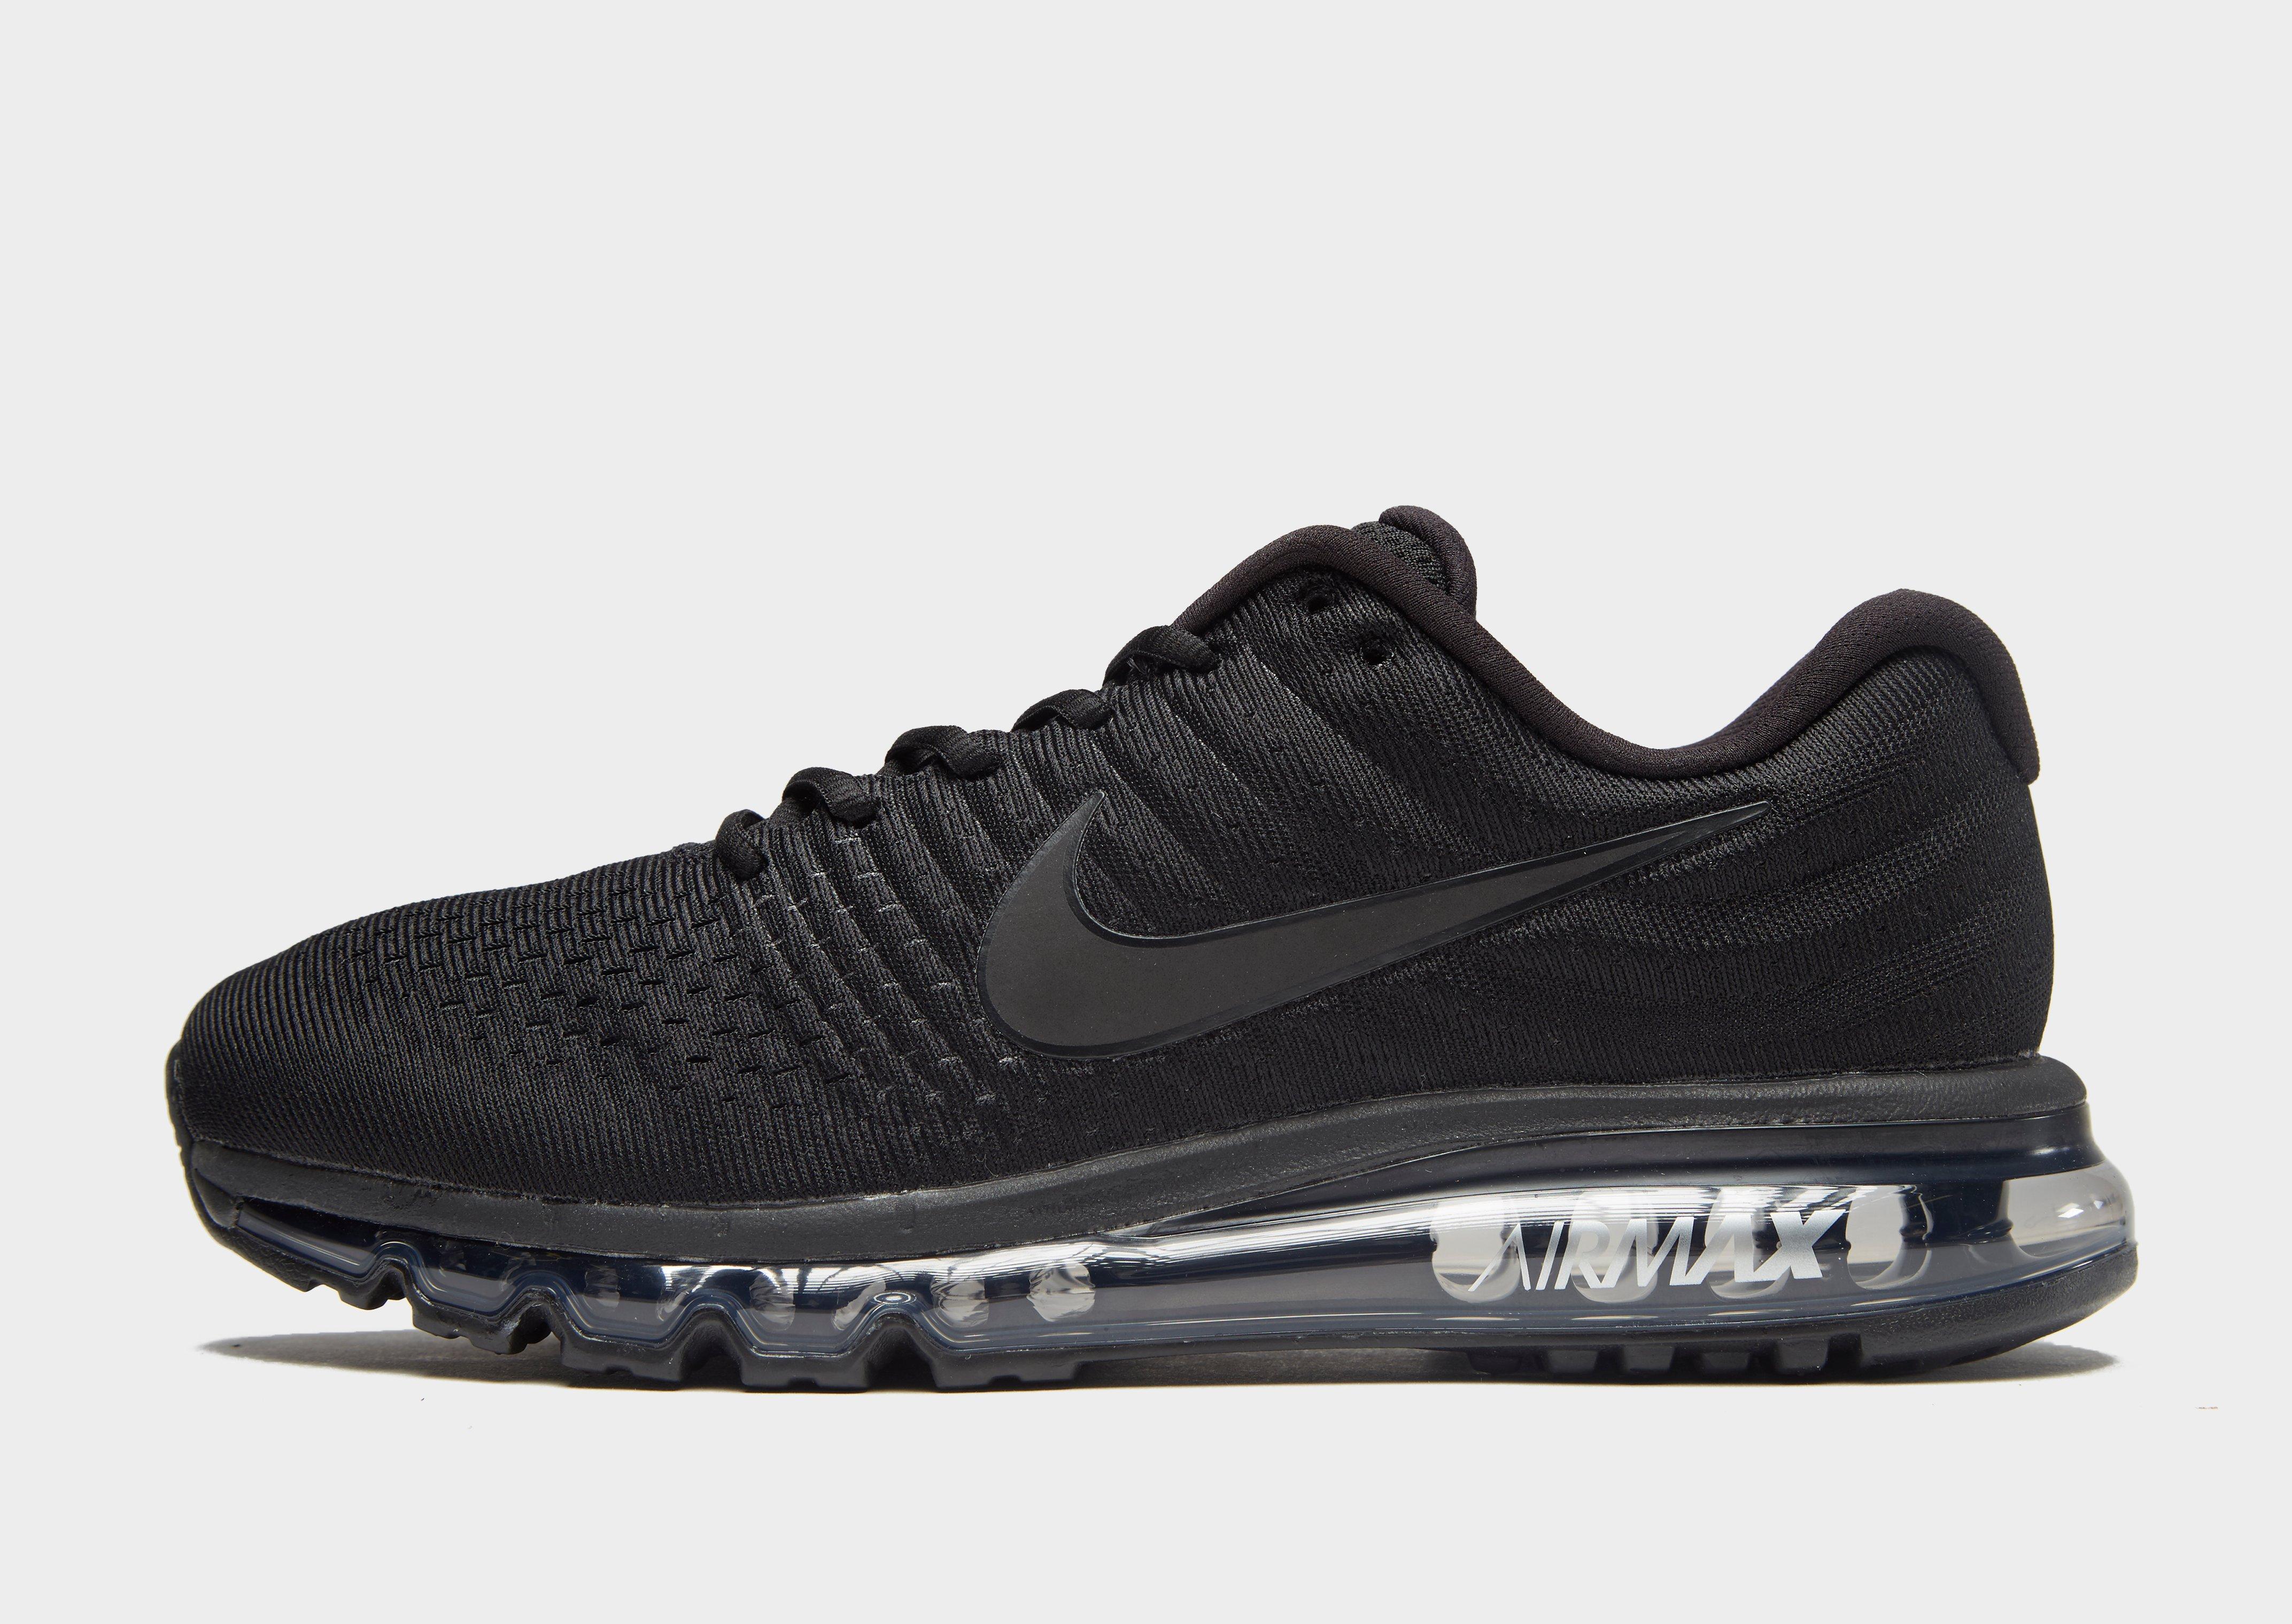 sports shoes 02ade 03e2e nike air max 2017 homme